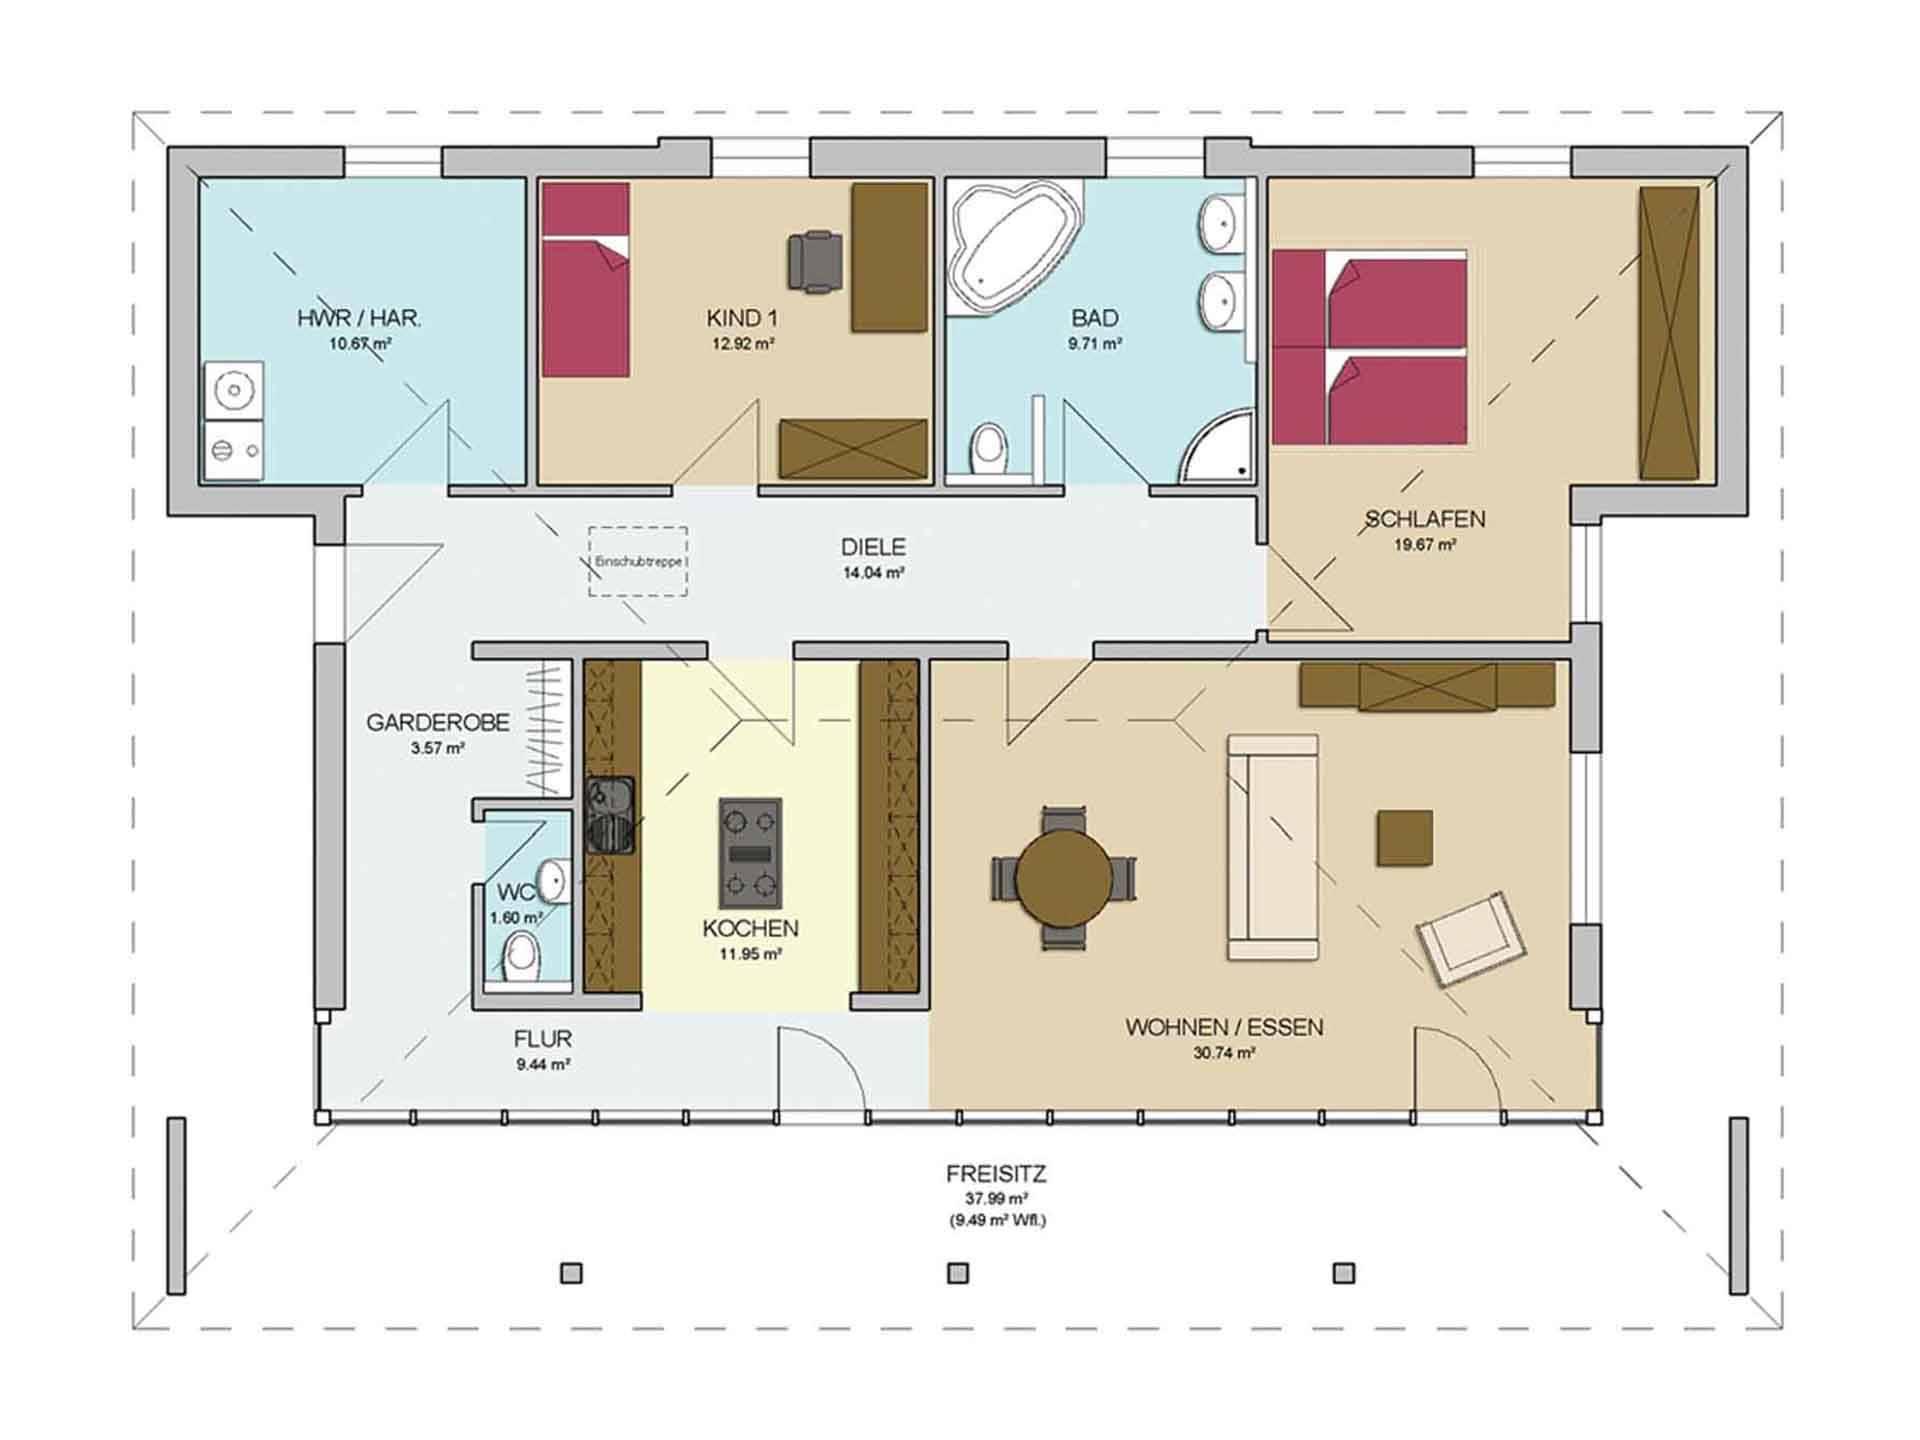 Grundriss Einfamilienhaus 130 Qm: Bungalow qm grundriss noveric ...